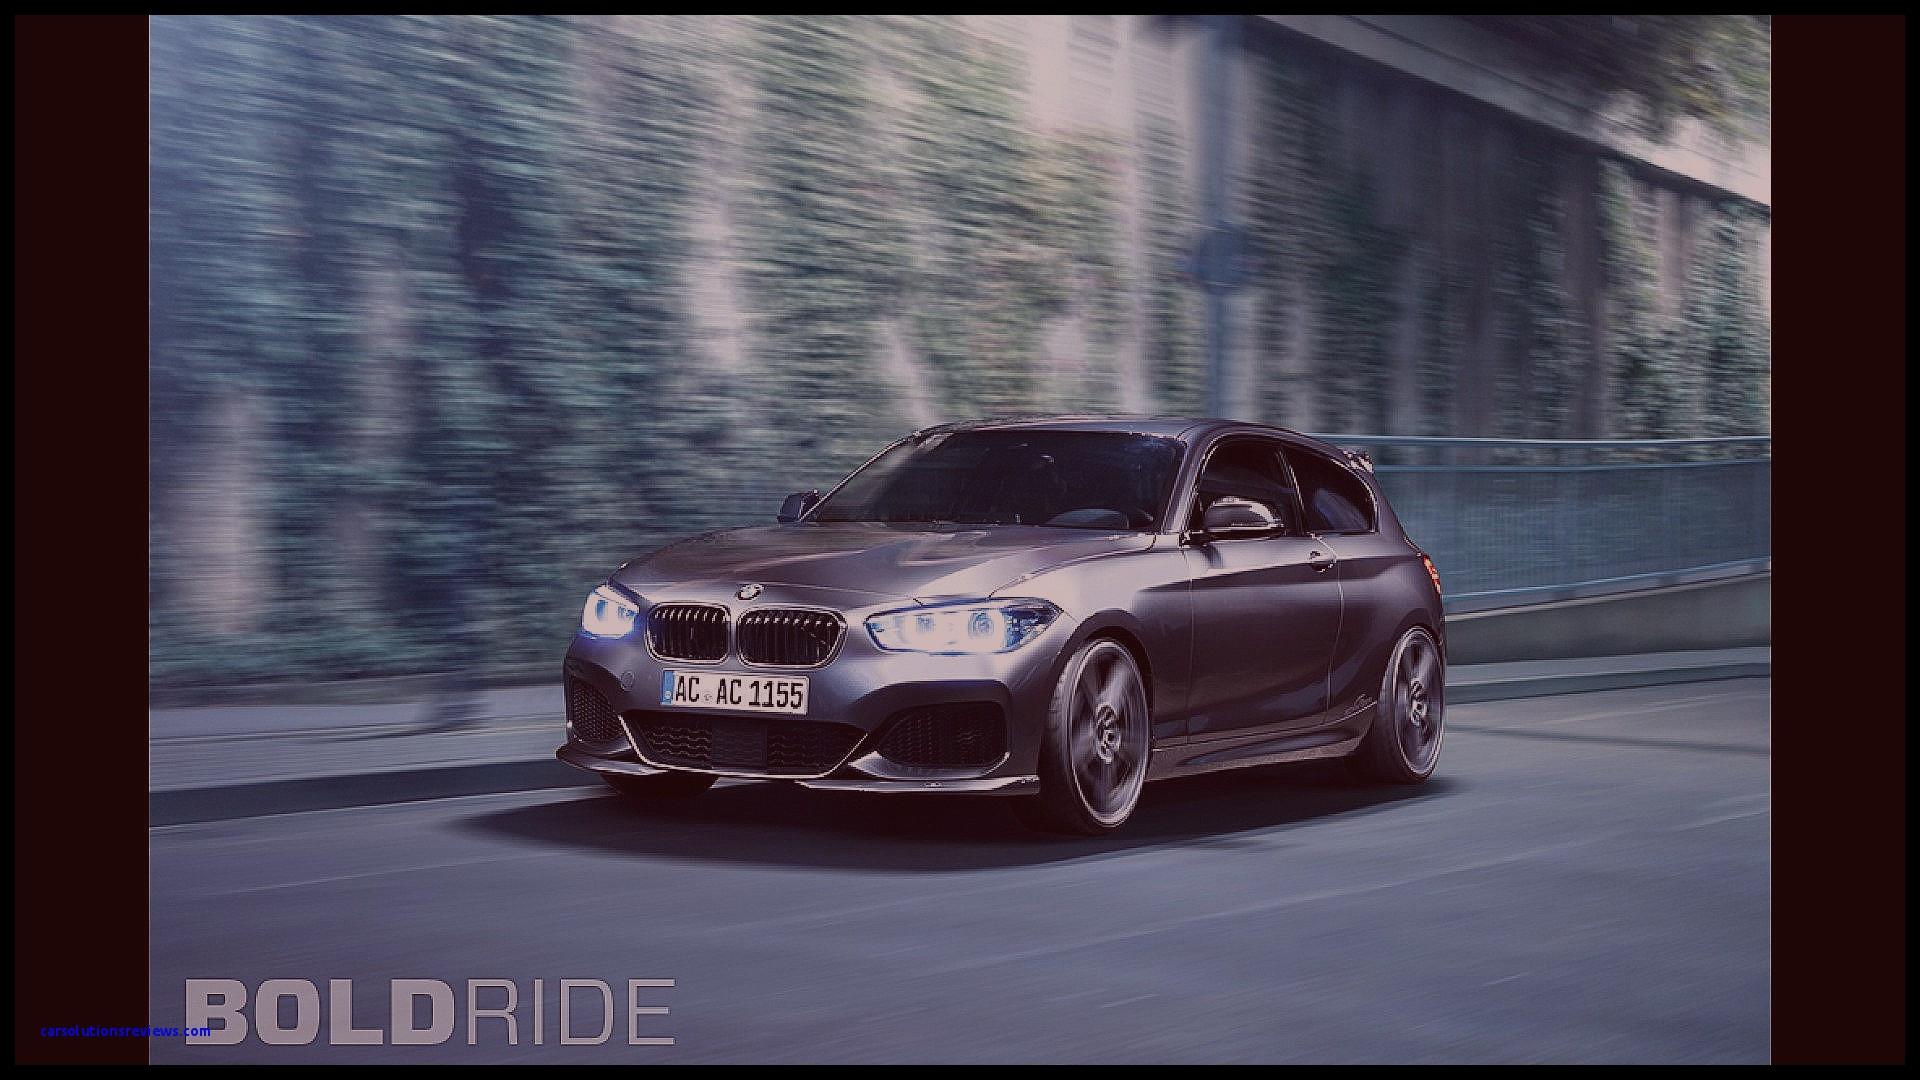 Car Latest Model 2015 Best Special Latest Bmw Cars Ac Schnitzer Bmw Acs1 5 0d